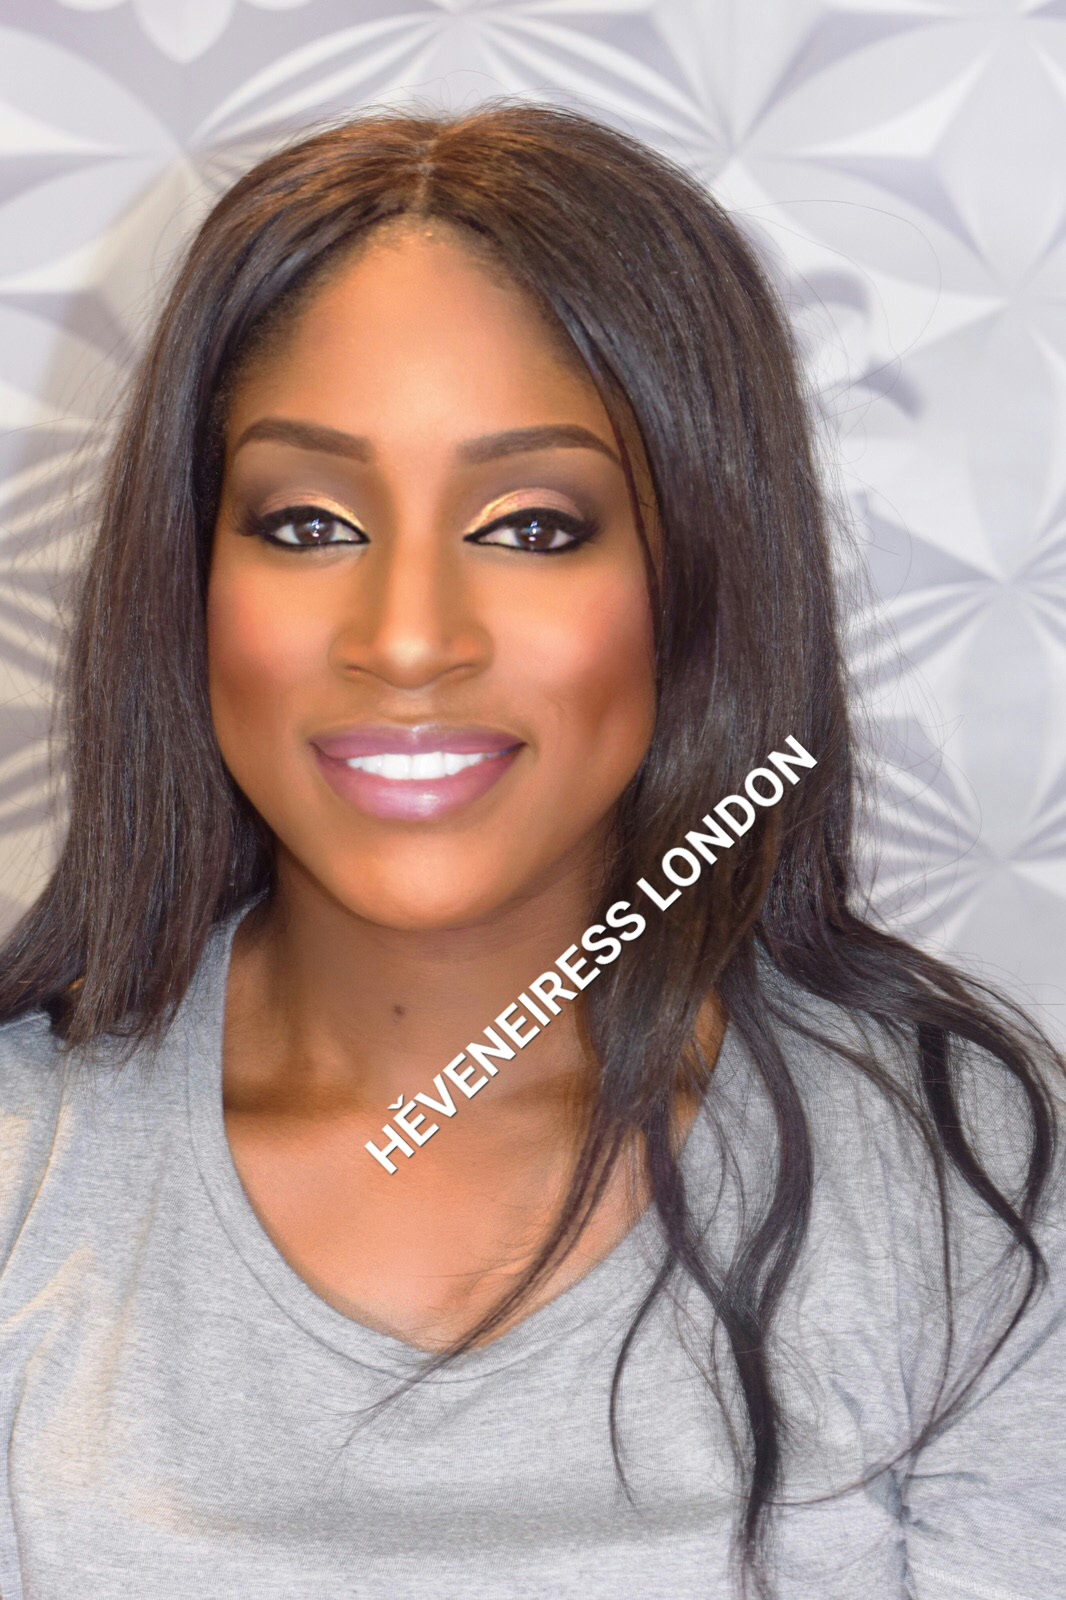 ... heveneiress - makeup artists in UK - london makeup artists - bridal makeup artist in london ...